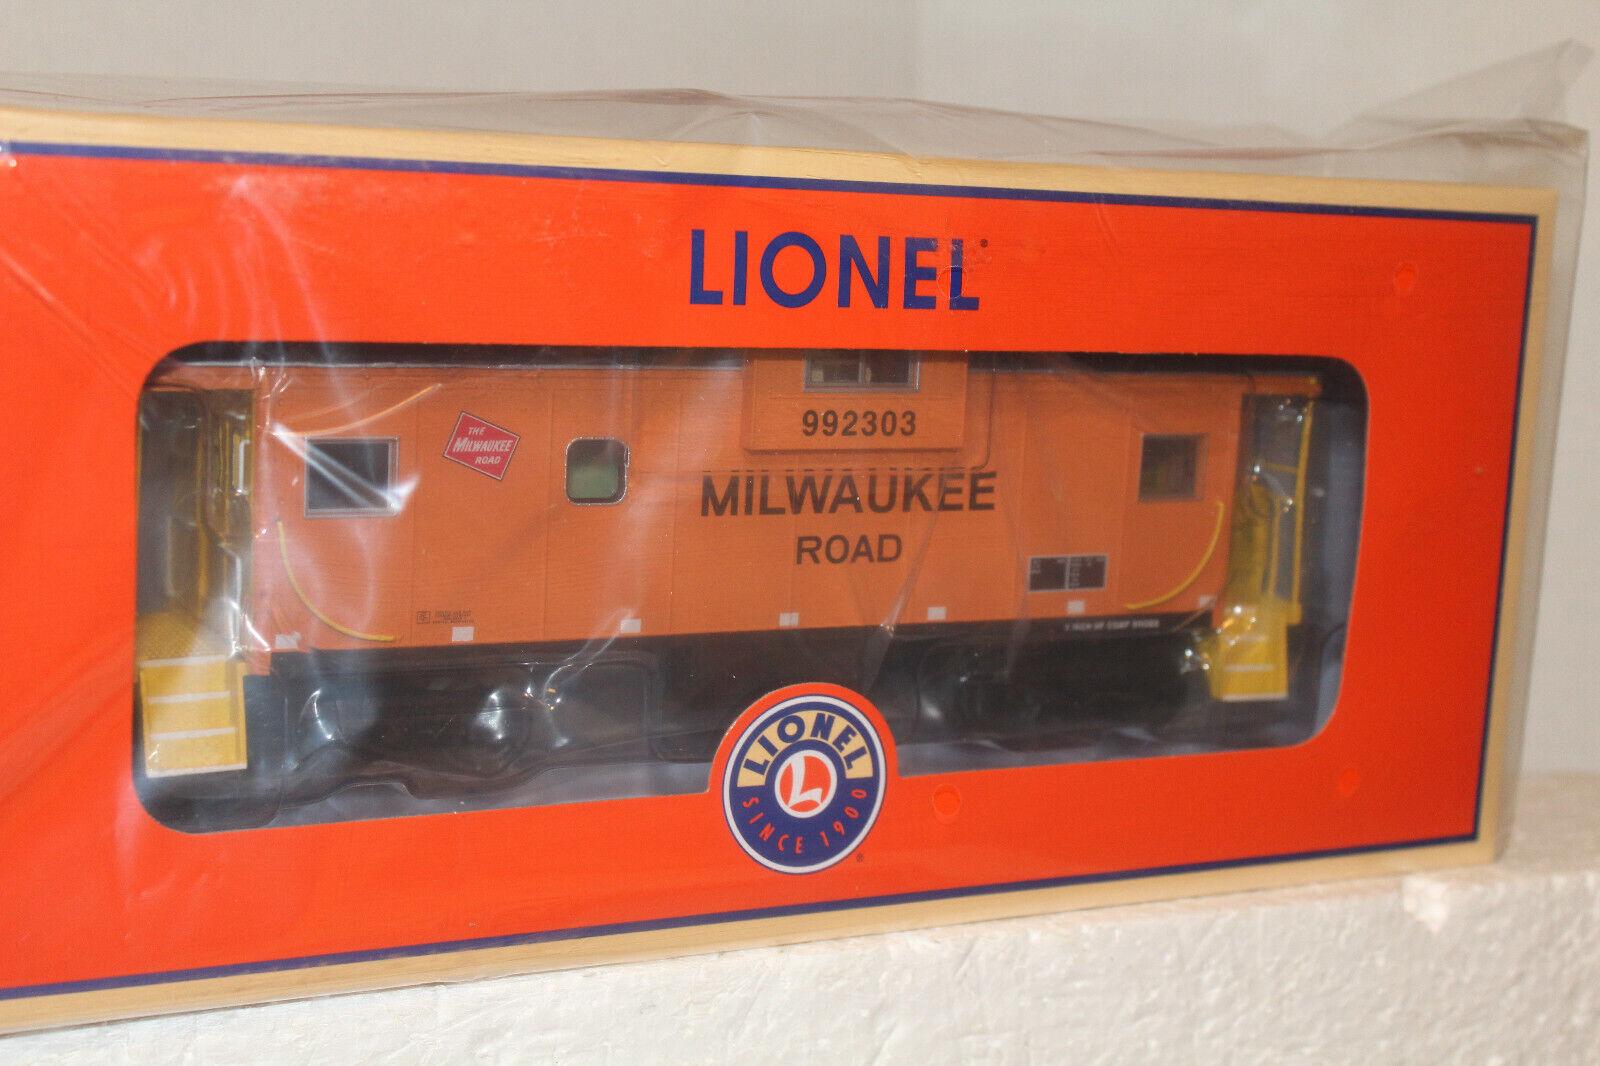 LIONEL  1926930 Milwaukee strada Extended Vision CupolaCam™ Caboose  992303